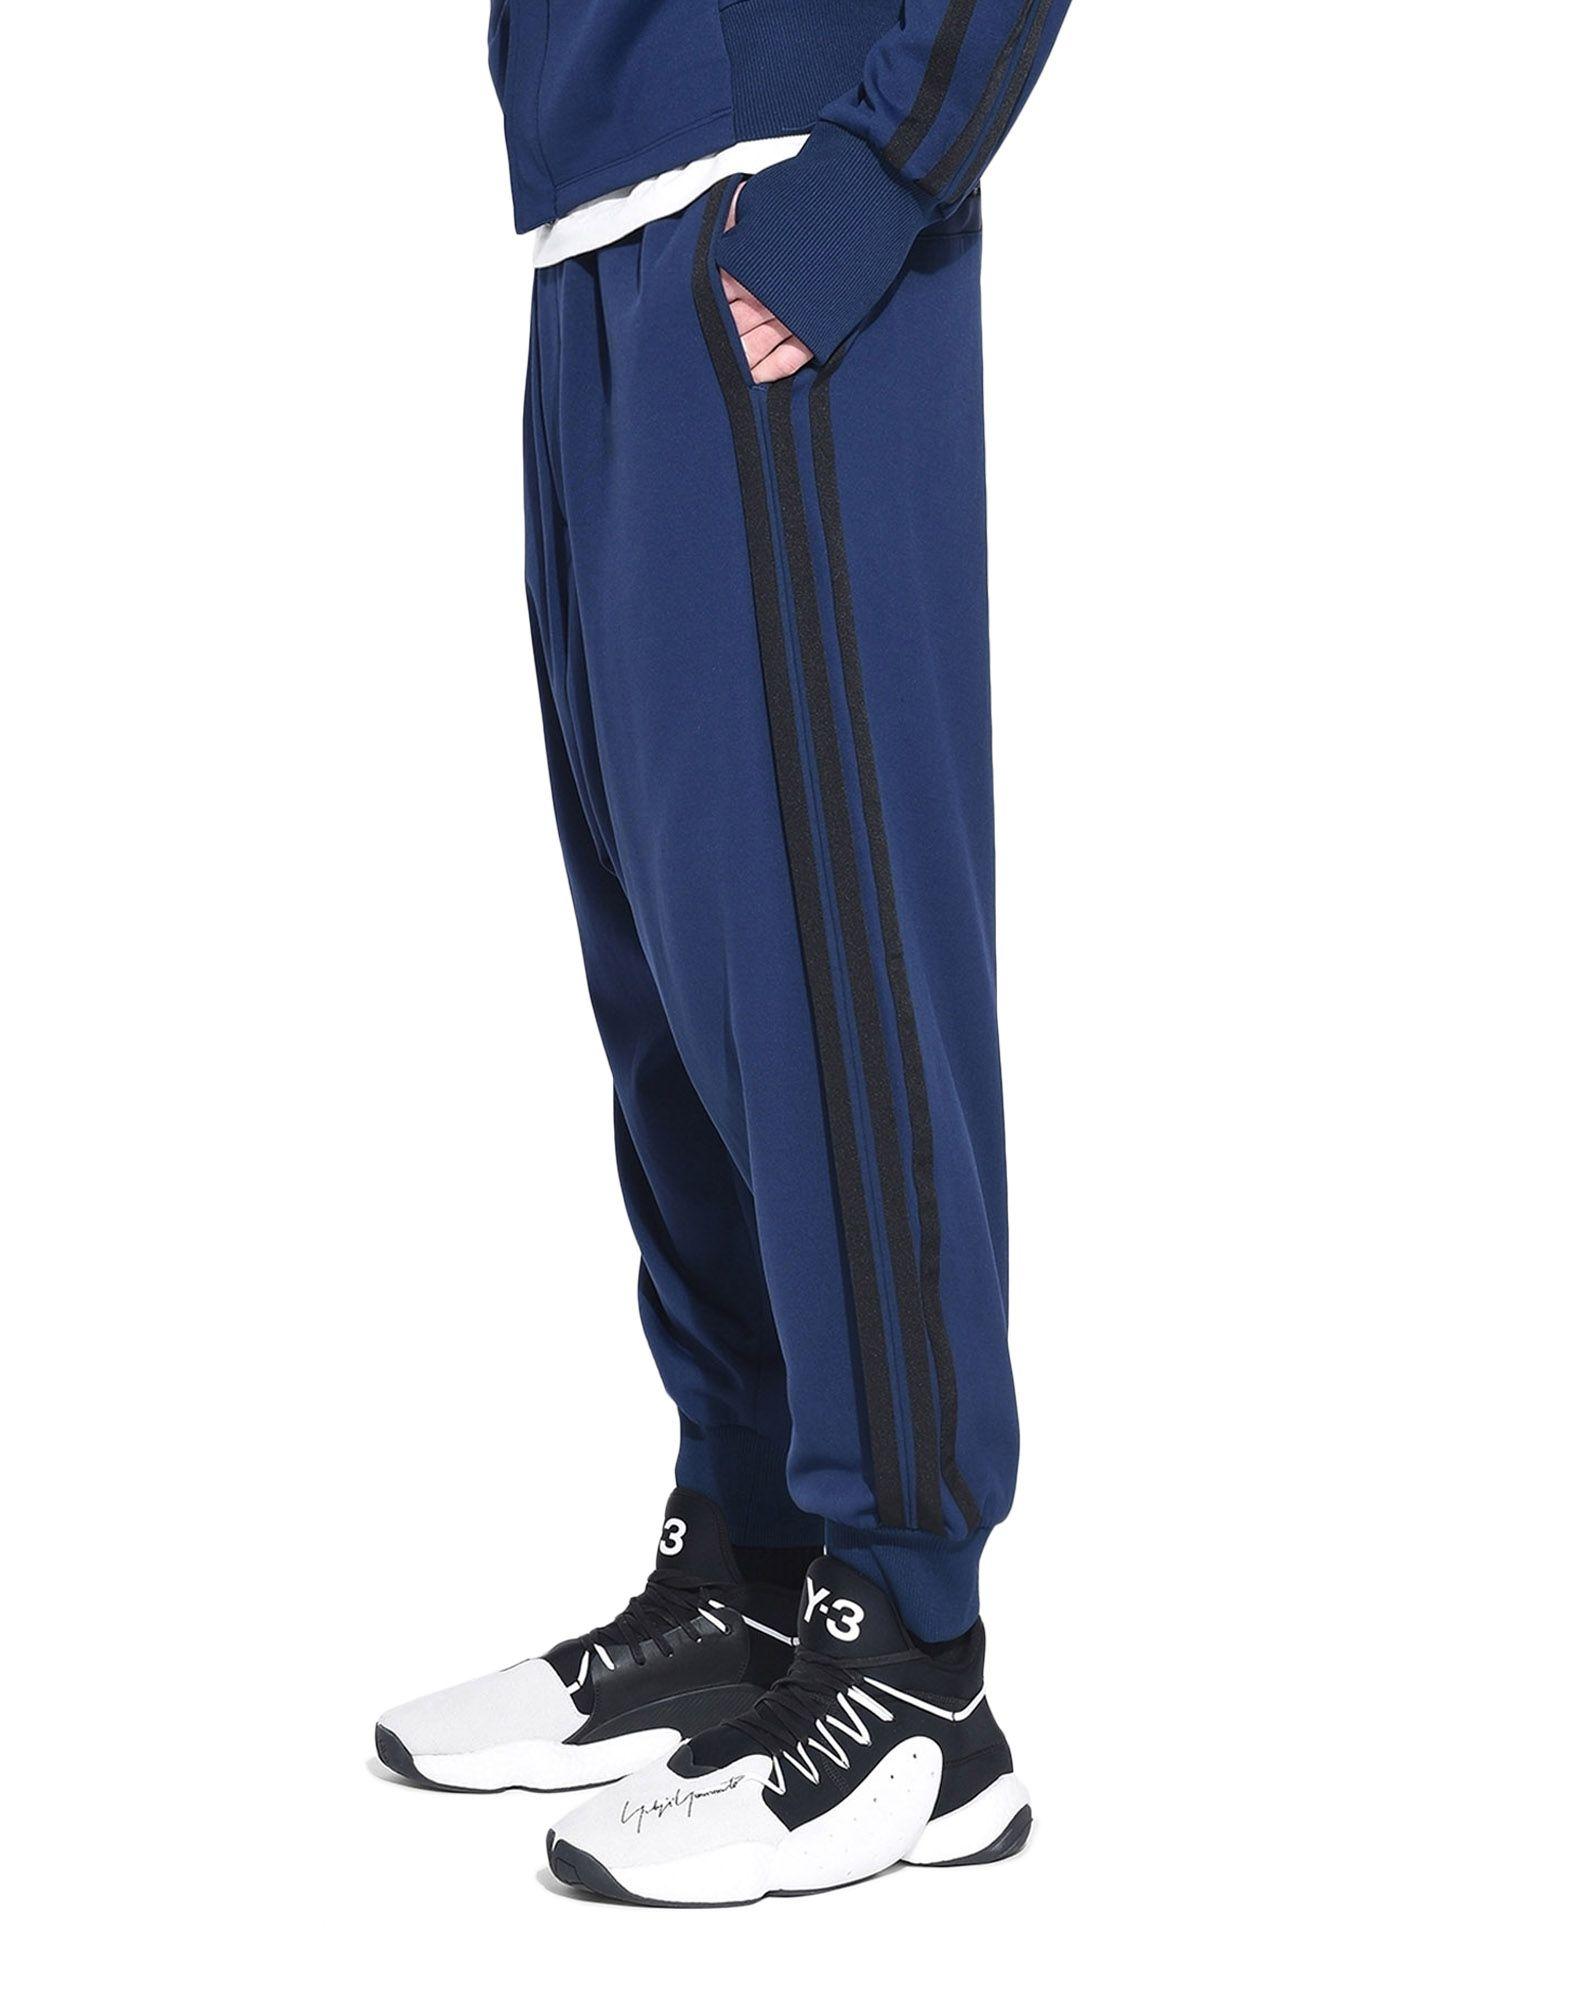 Y-3 Y-3 3-Stripes Selvedge Matte Track Pants Track pant Herren e